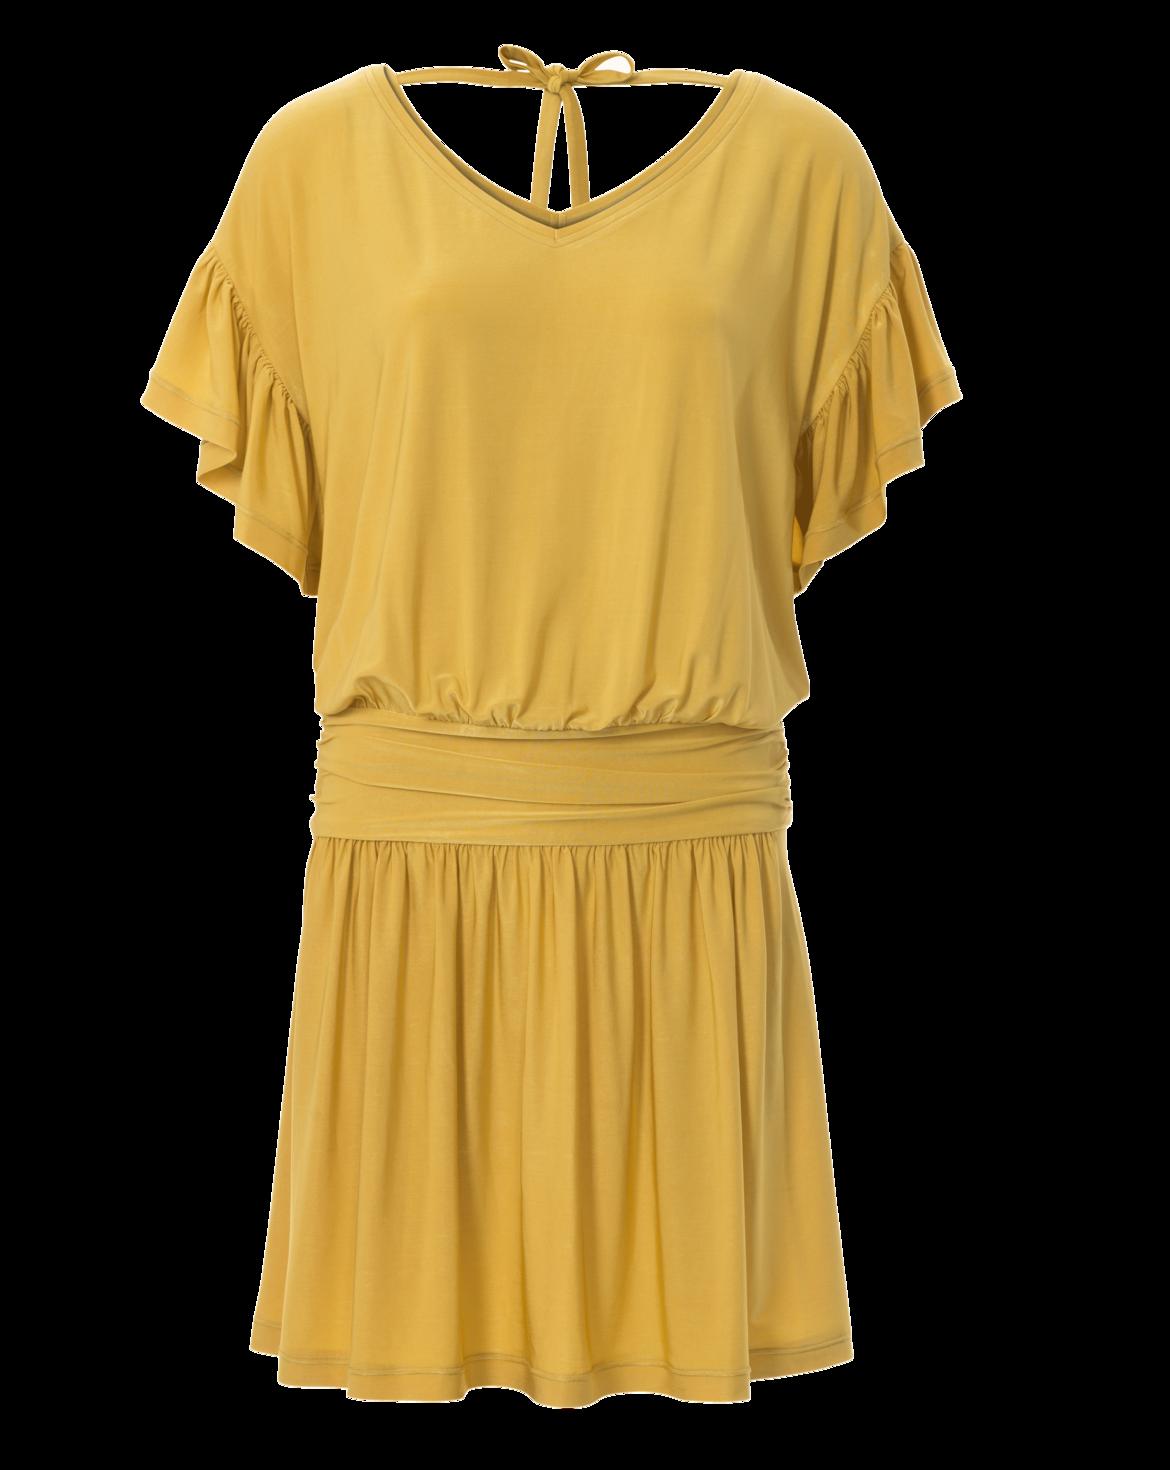 Schnittmuster Minikleid 03/2017 #117B | Sewing dresses | Pinterest ...